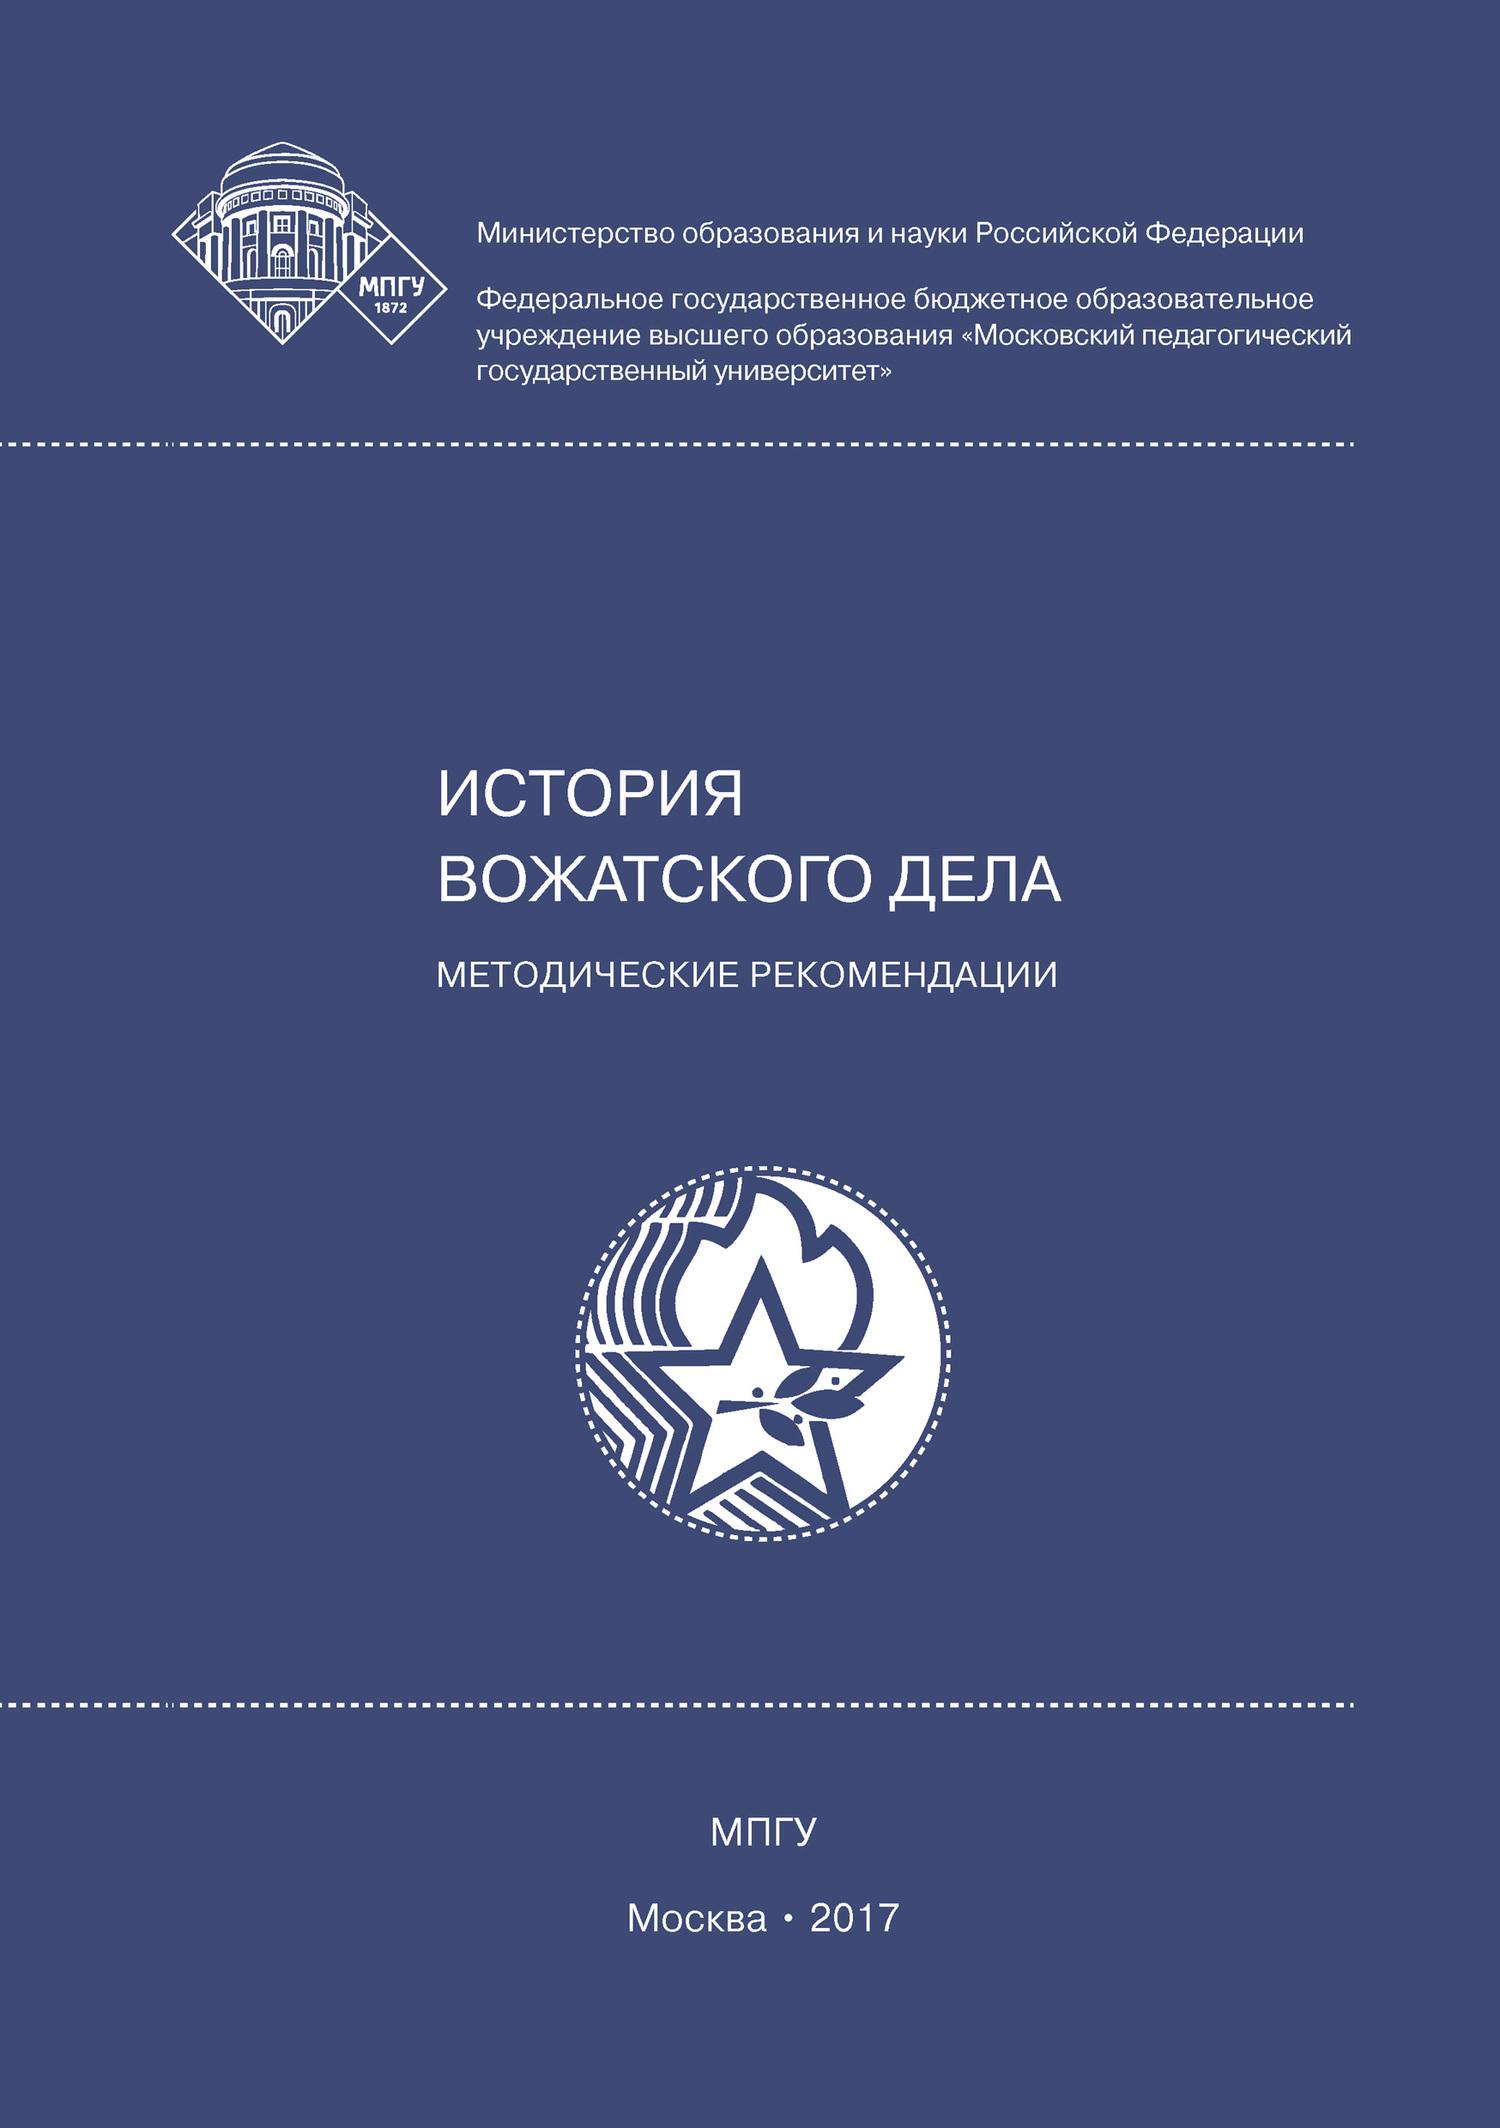 Елена Леванова, Татьяна Сахарова - История вожатского дела